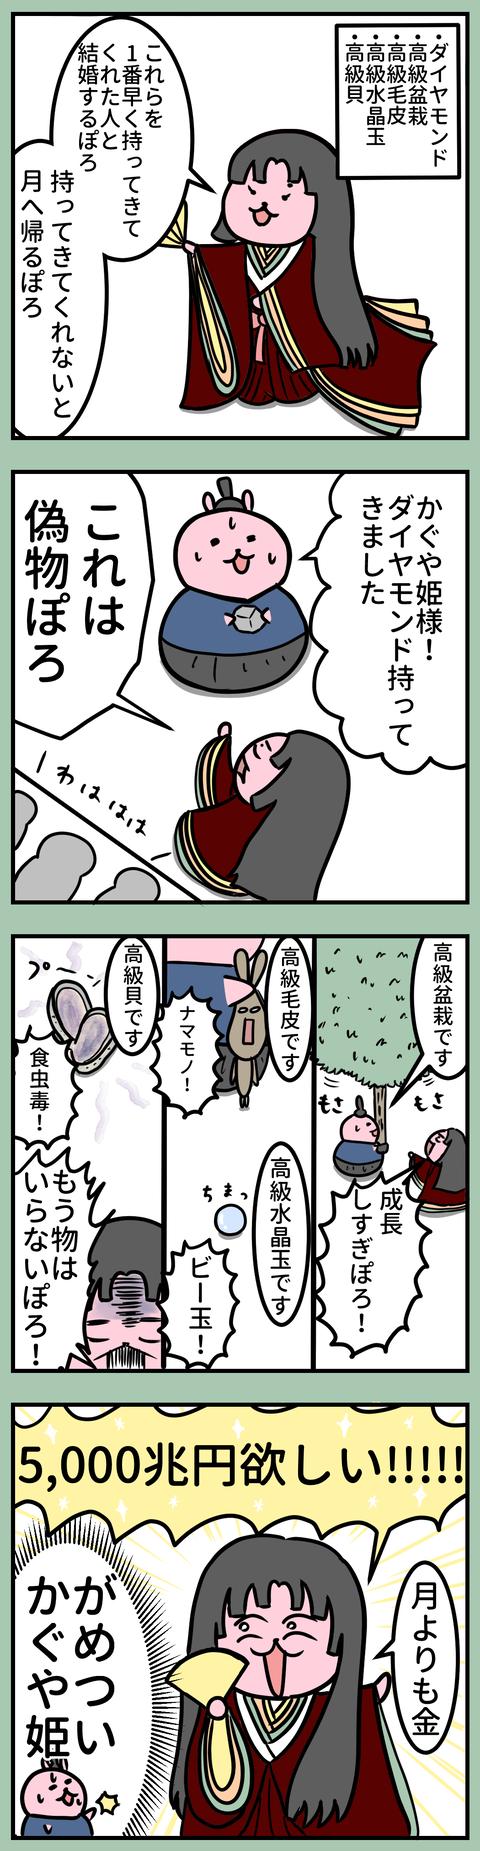 manga-yuzuporo93-2